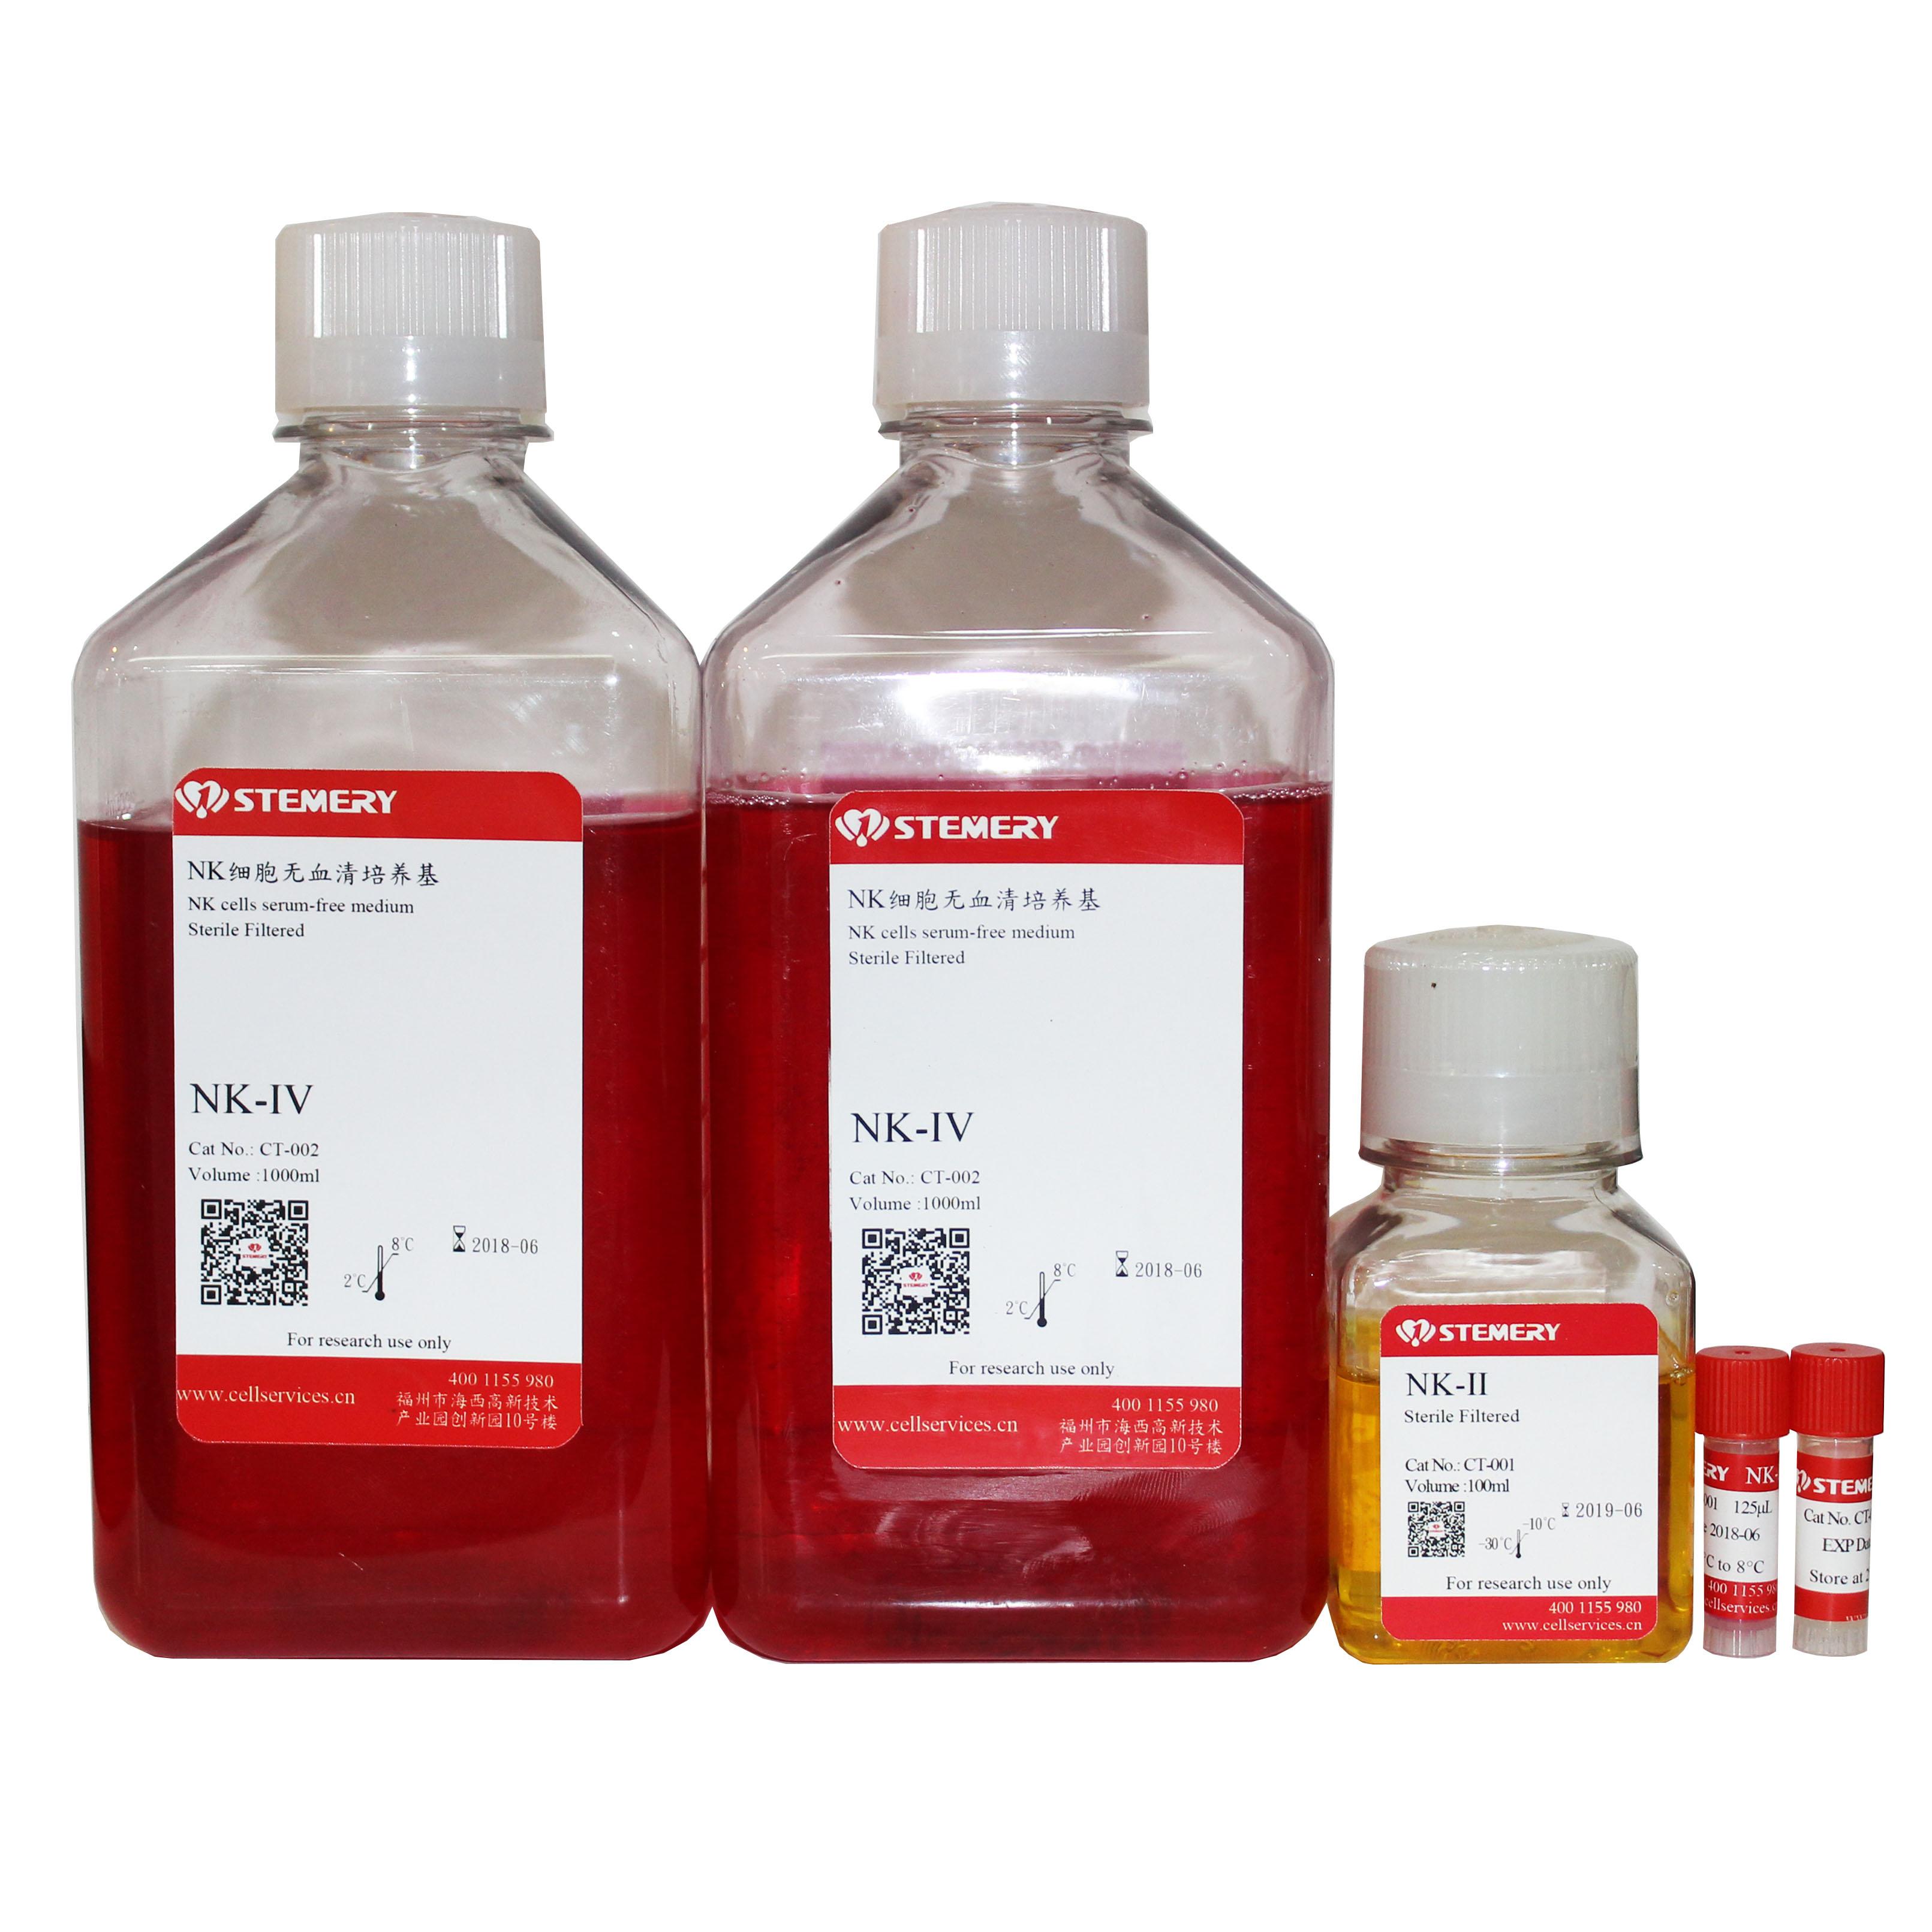 NK细胞高效扩增试剂盒